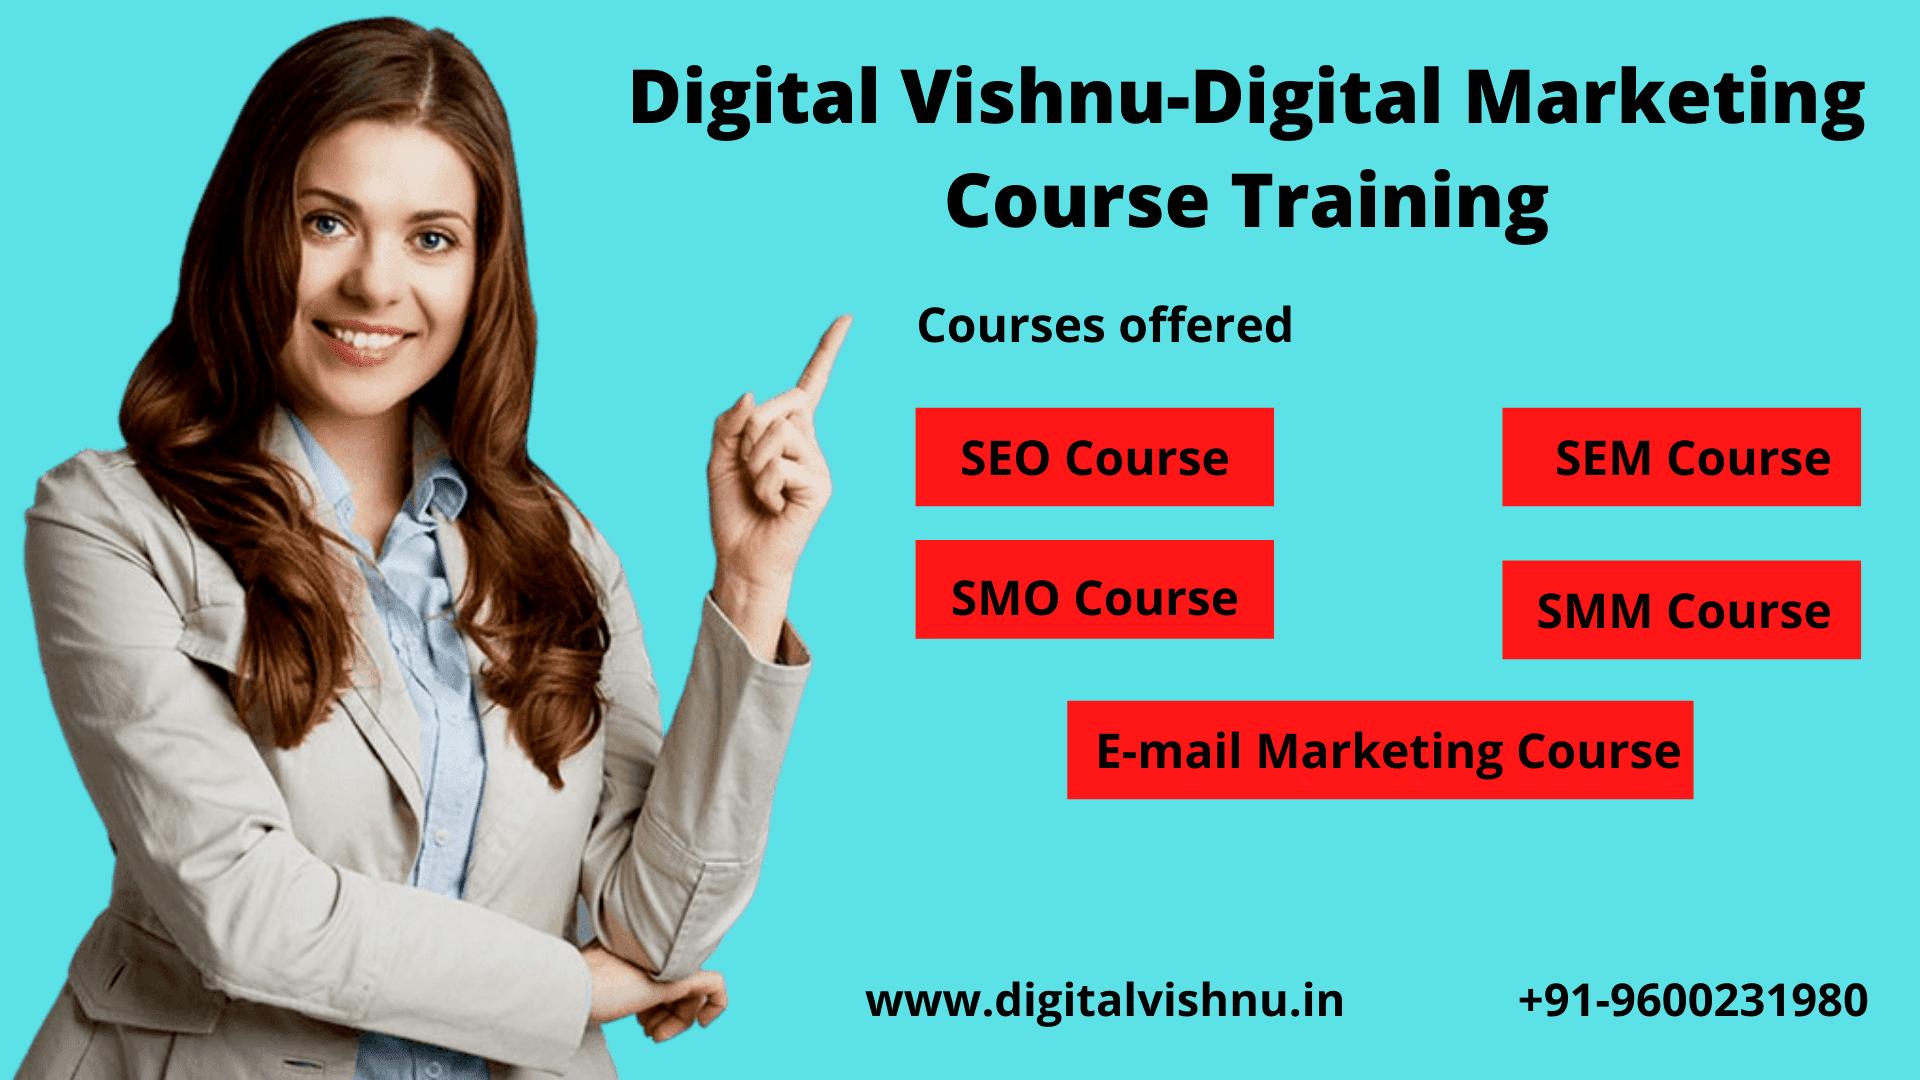 Digital Vishnu - Digital Marketing Course